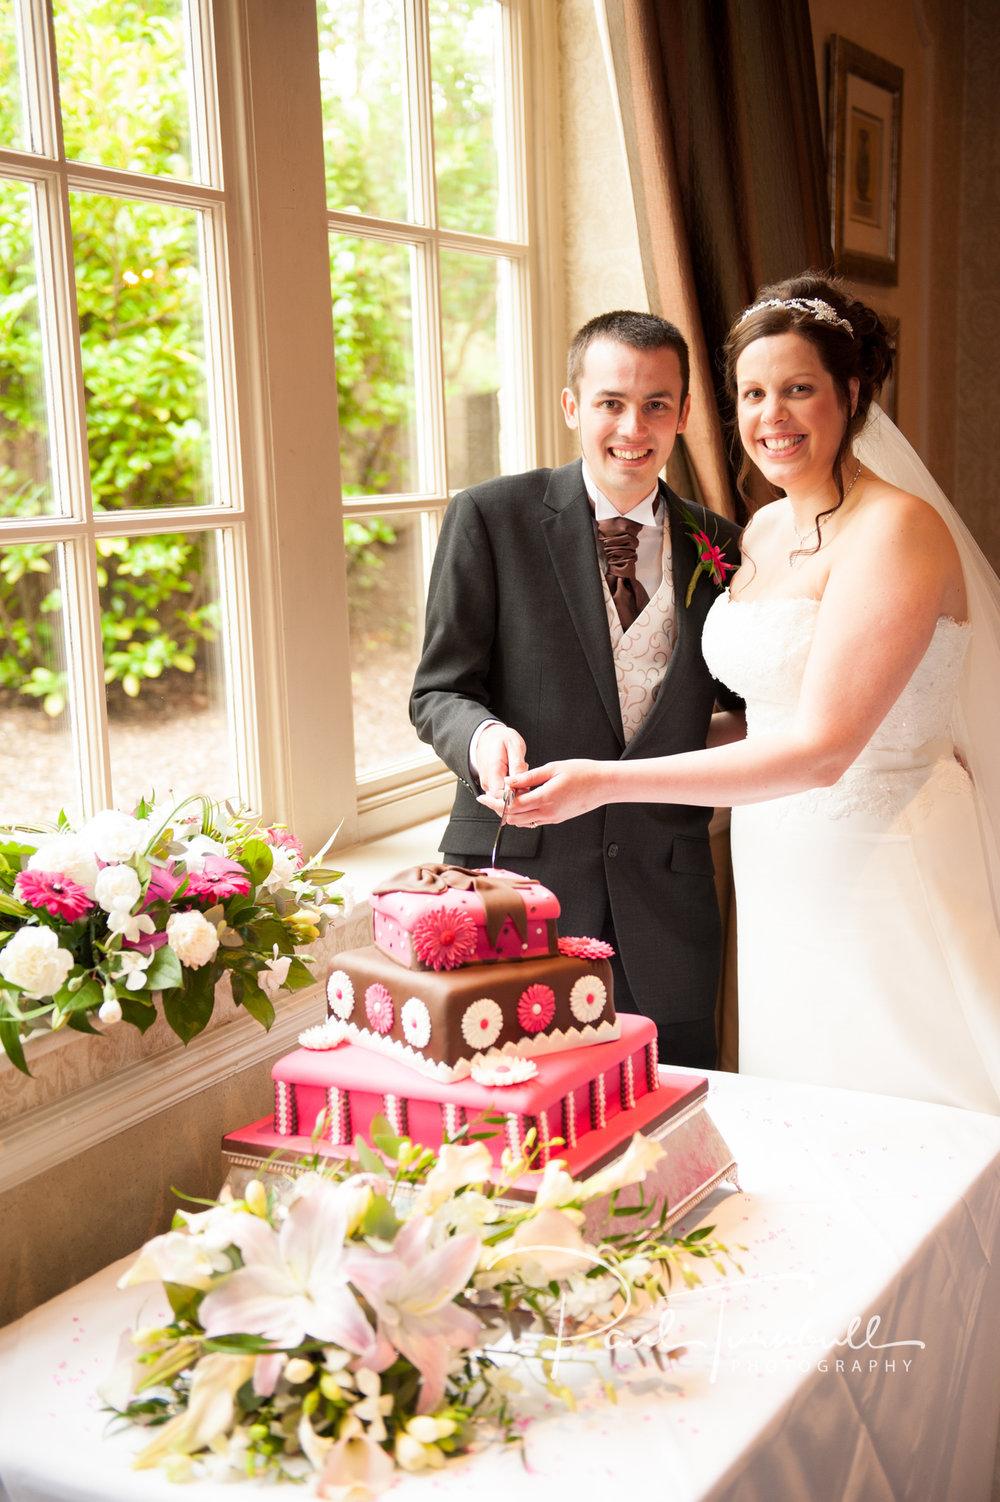 wedding-photography-wood-hall-wetherby-yorkshire-052.jpg